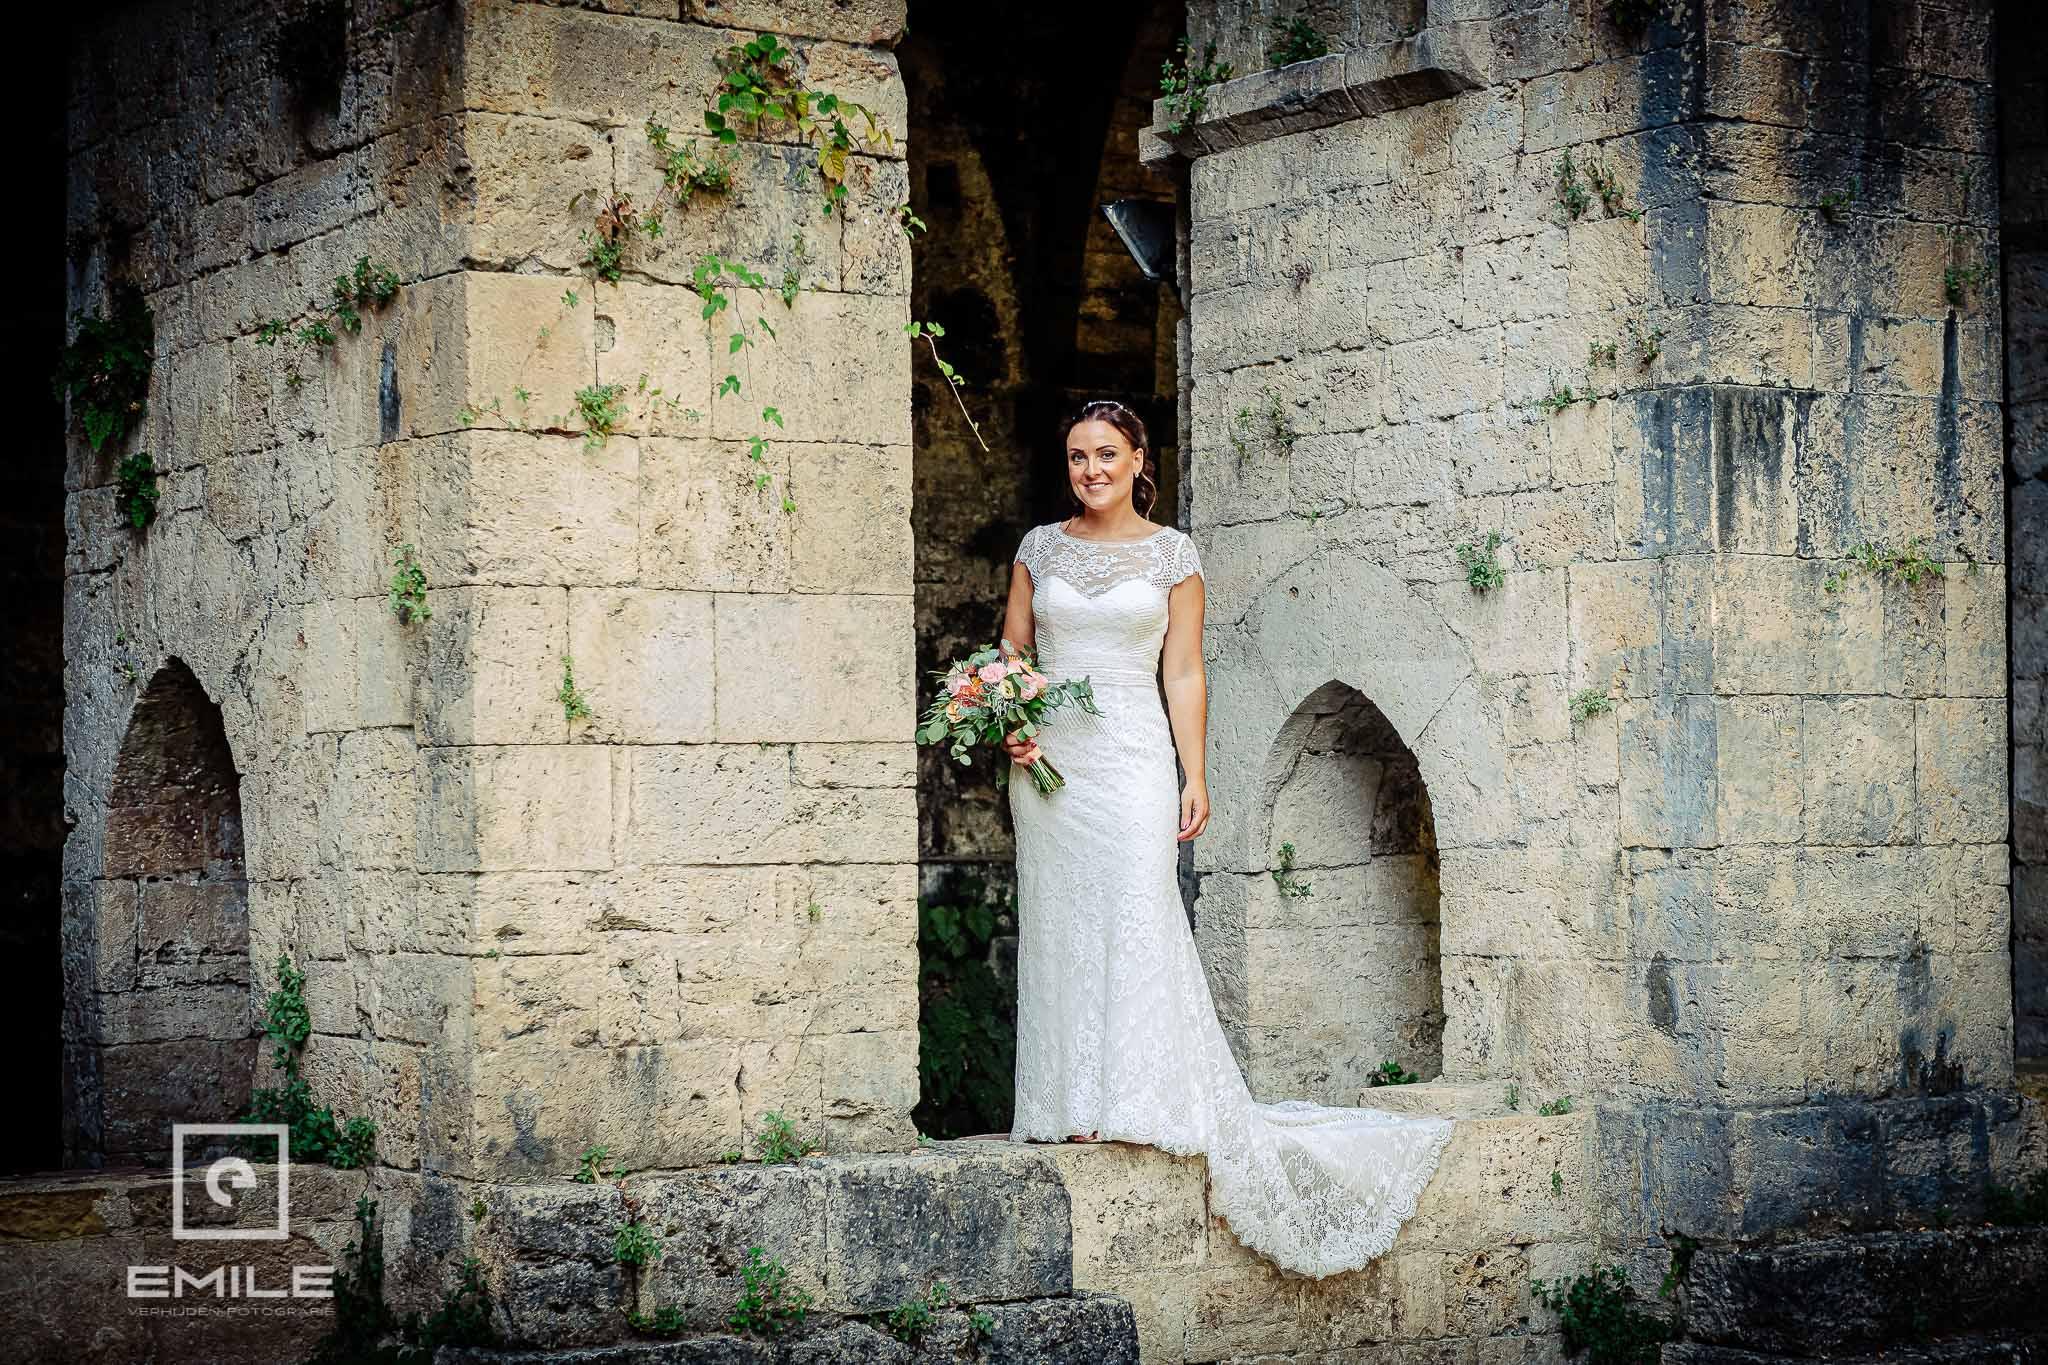 Bruid staand in nis bij ruine in San Ginignamo Italie destination wedding